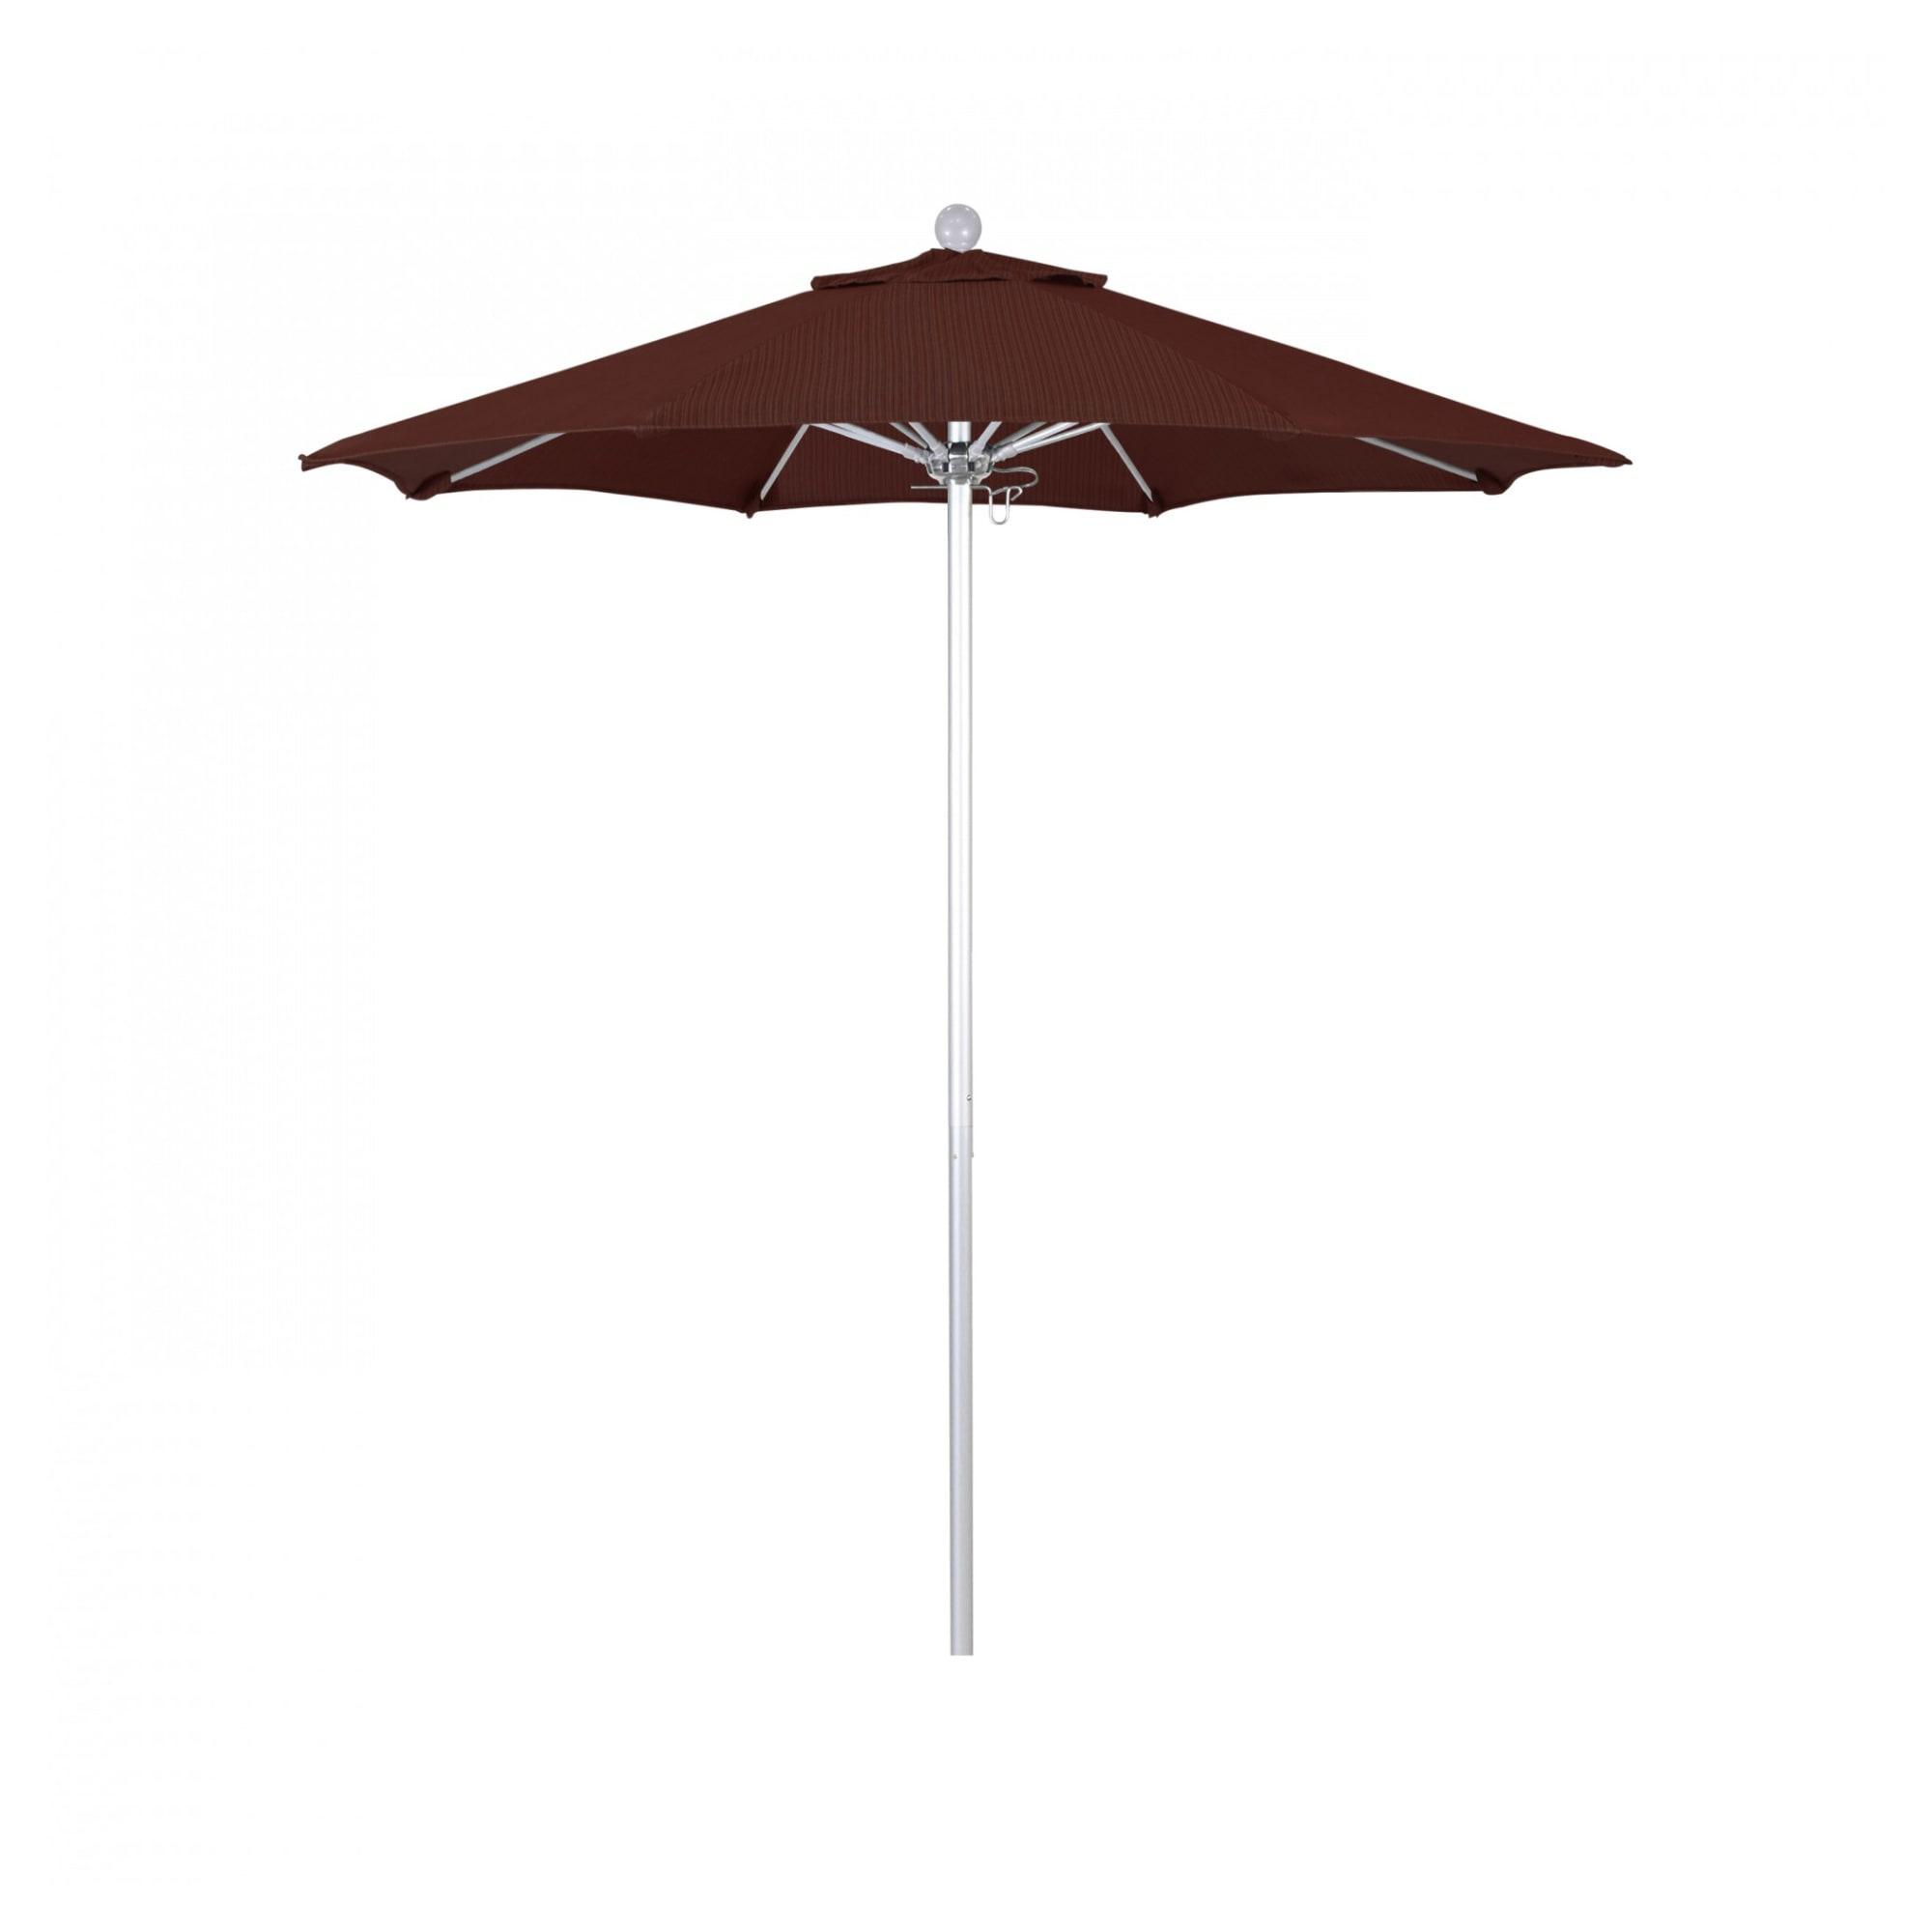 9 ft Casey Silver Anodized Aluminum Commercial Umbrella - 9' with 9 ft Casey Silver Anodized Aluminum Commercial Umbrella - 9'